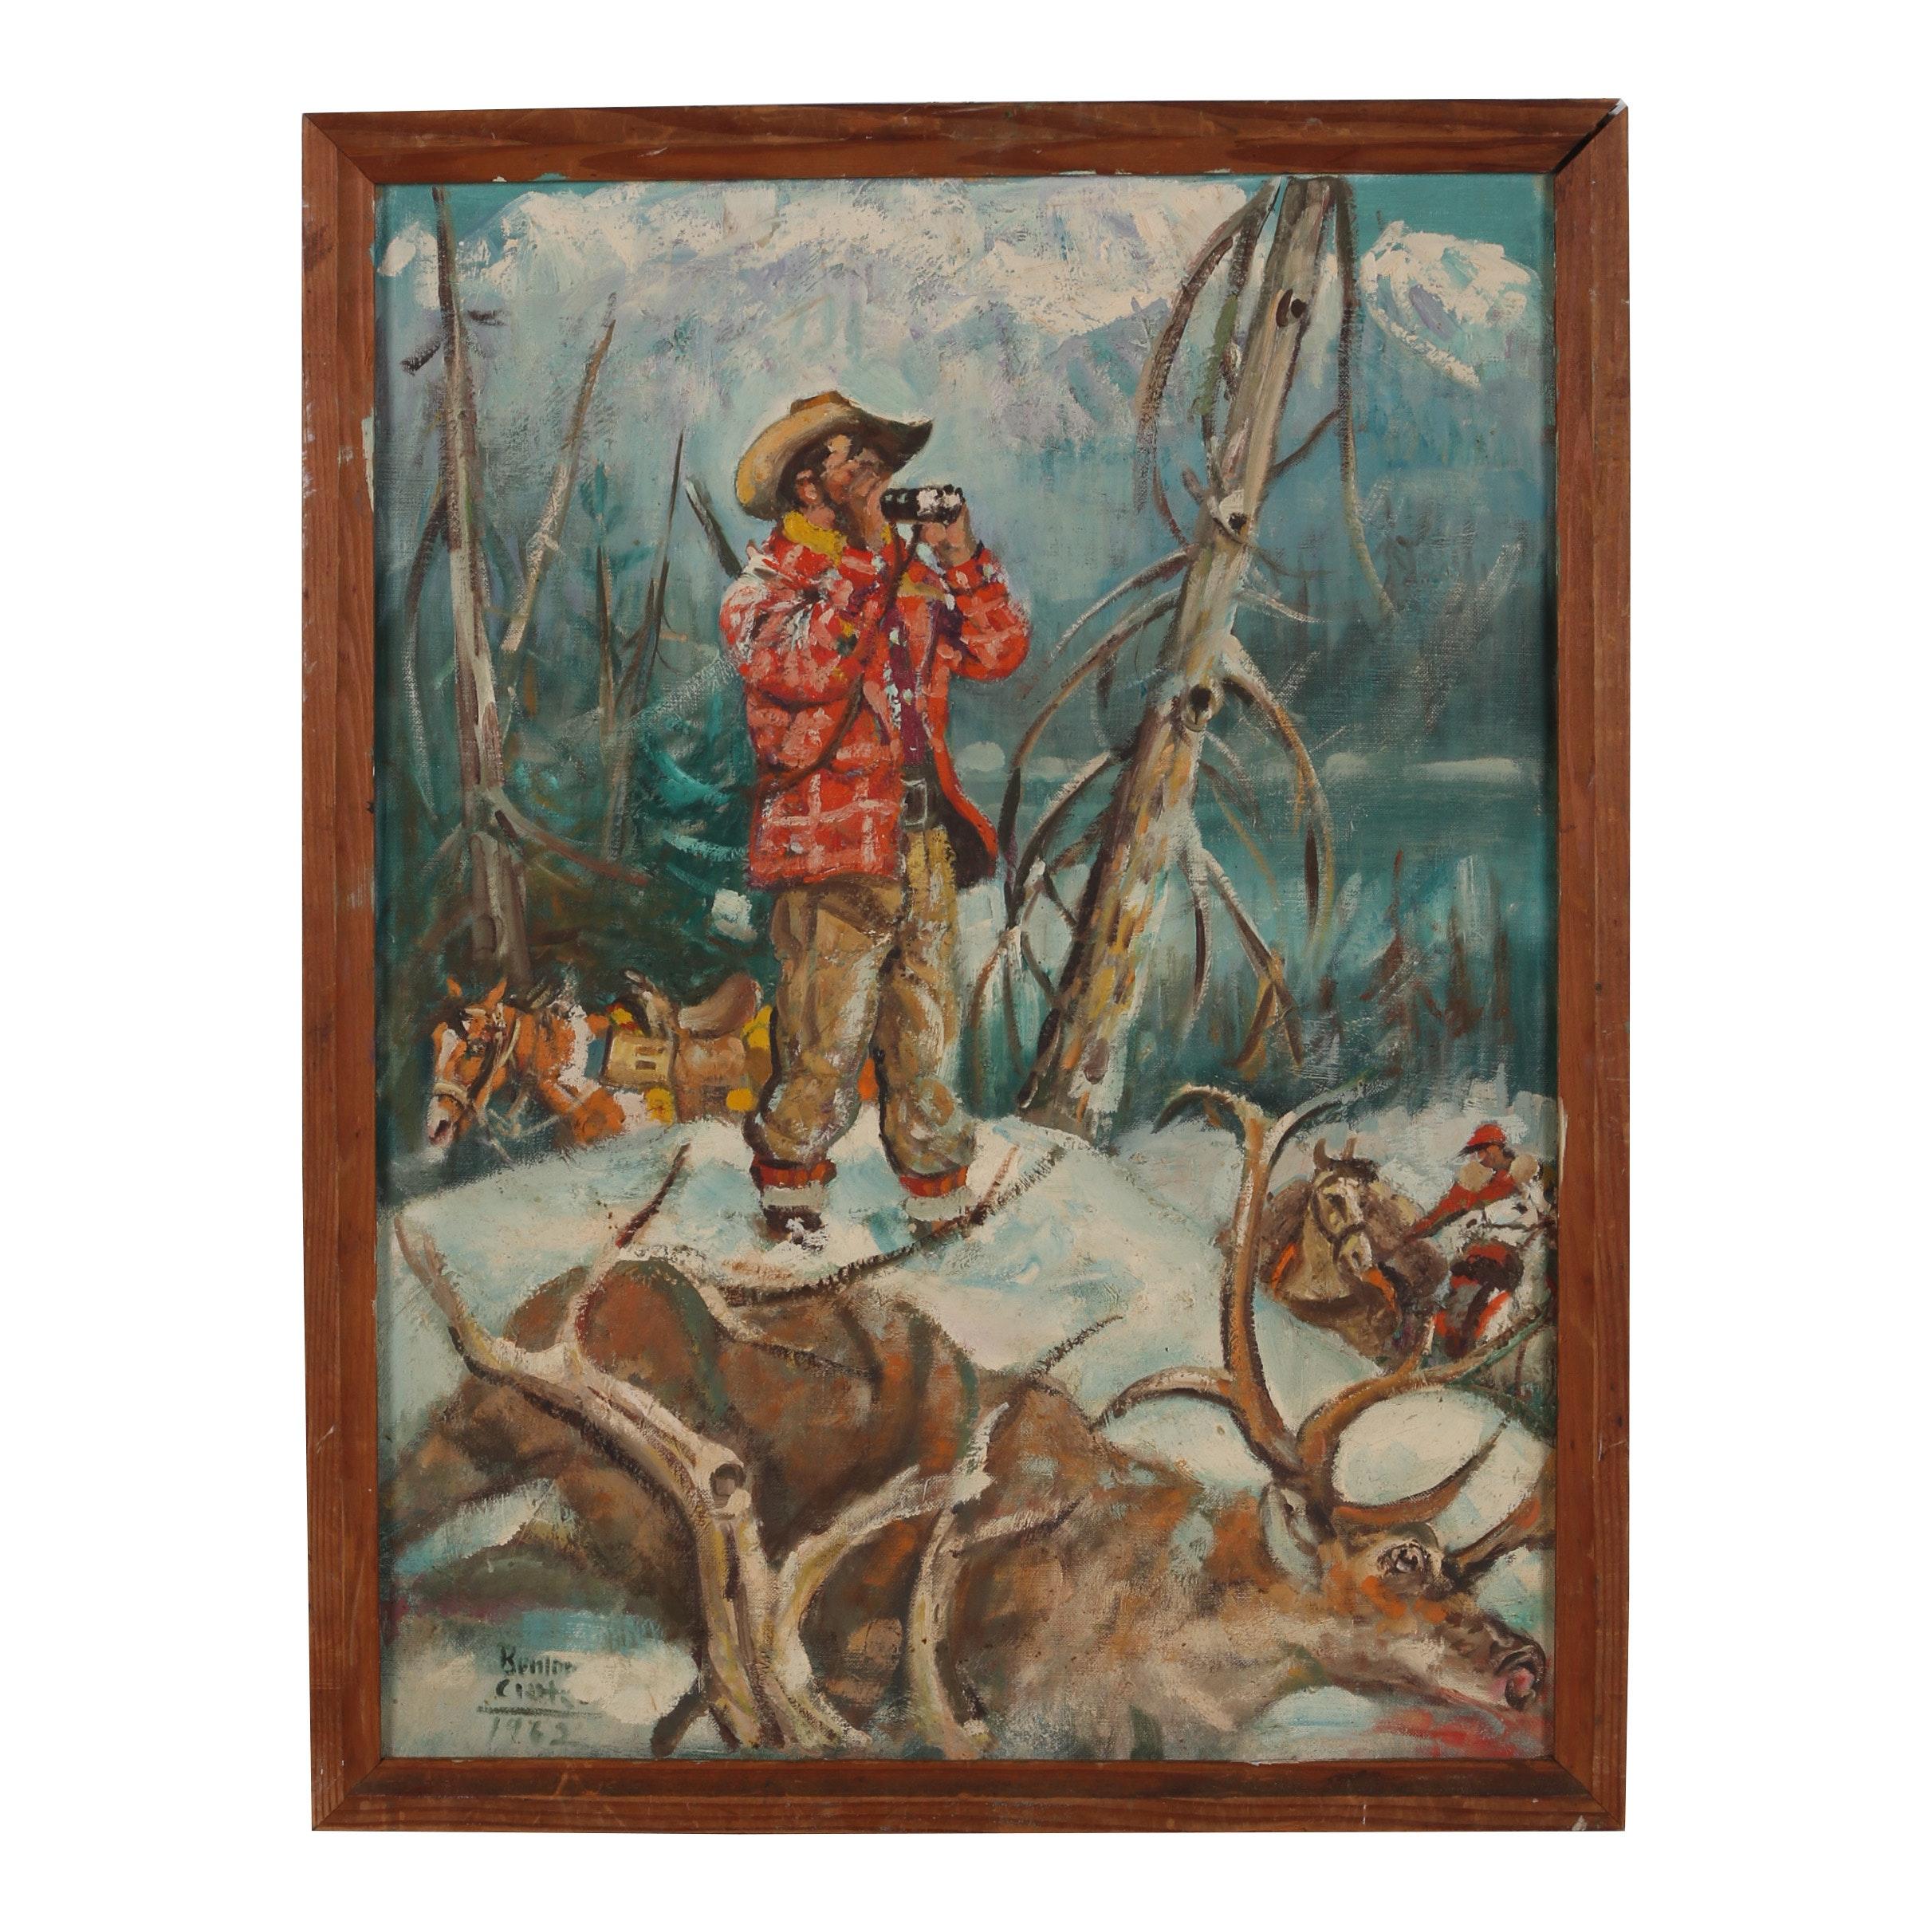 Oil Painting in the Manner of Benton Clark